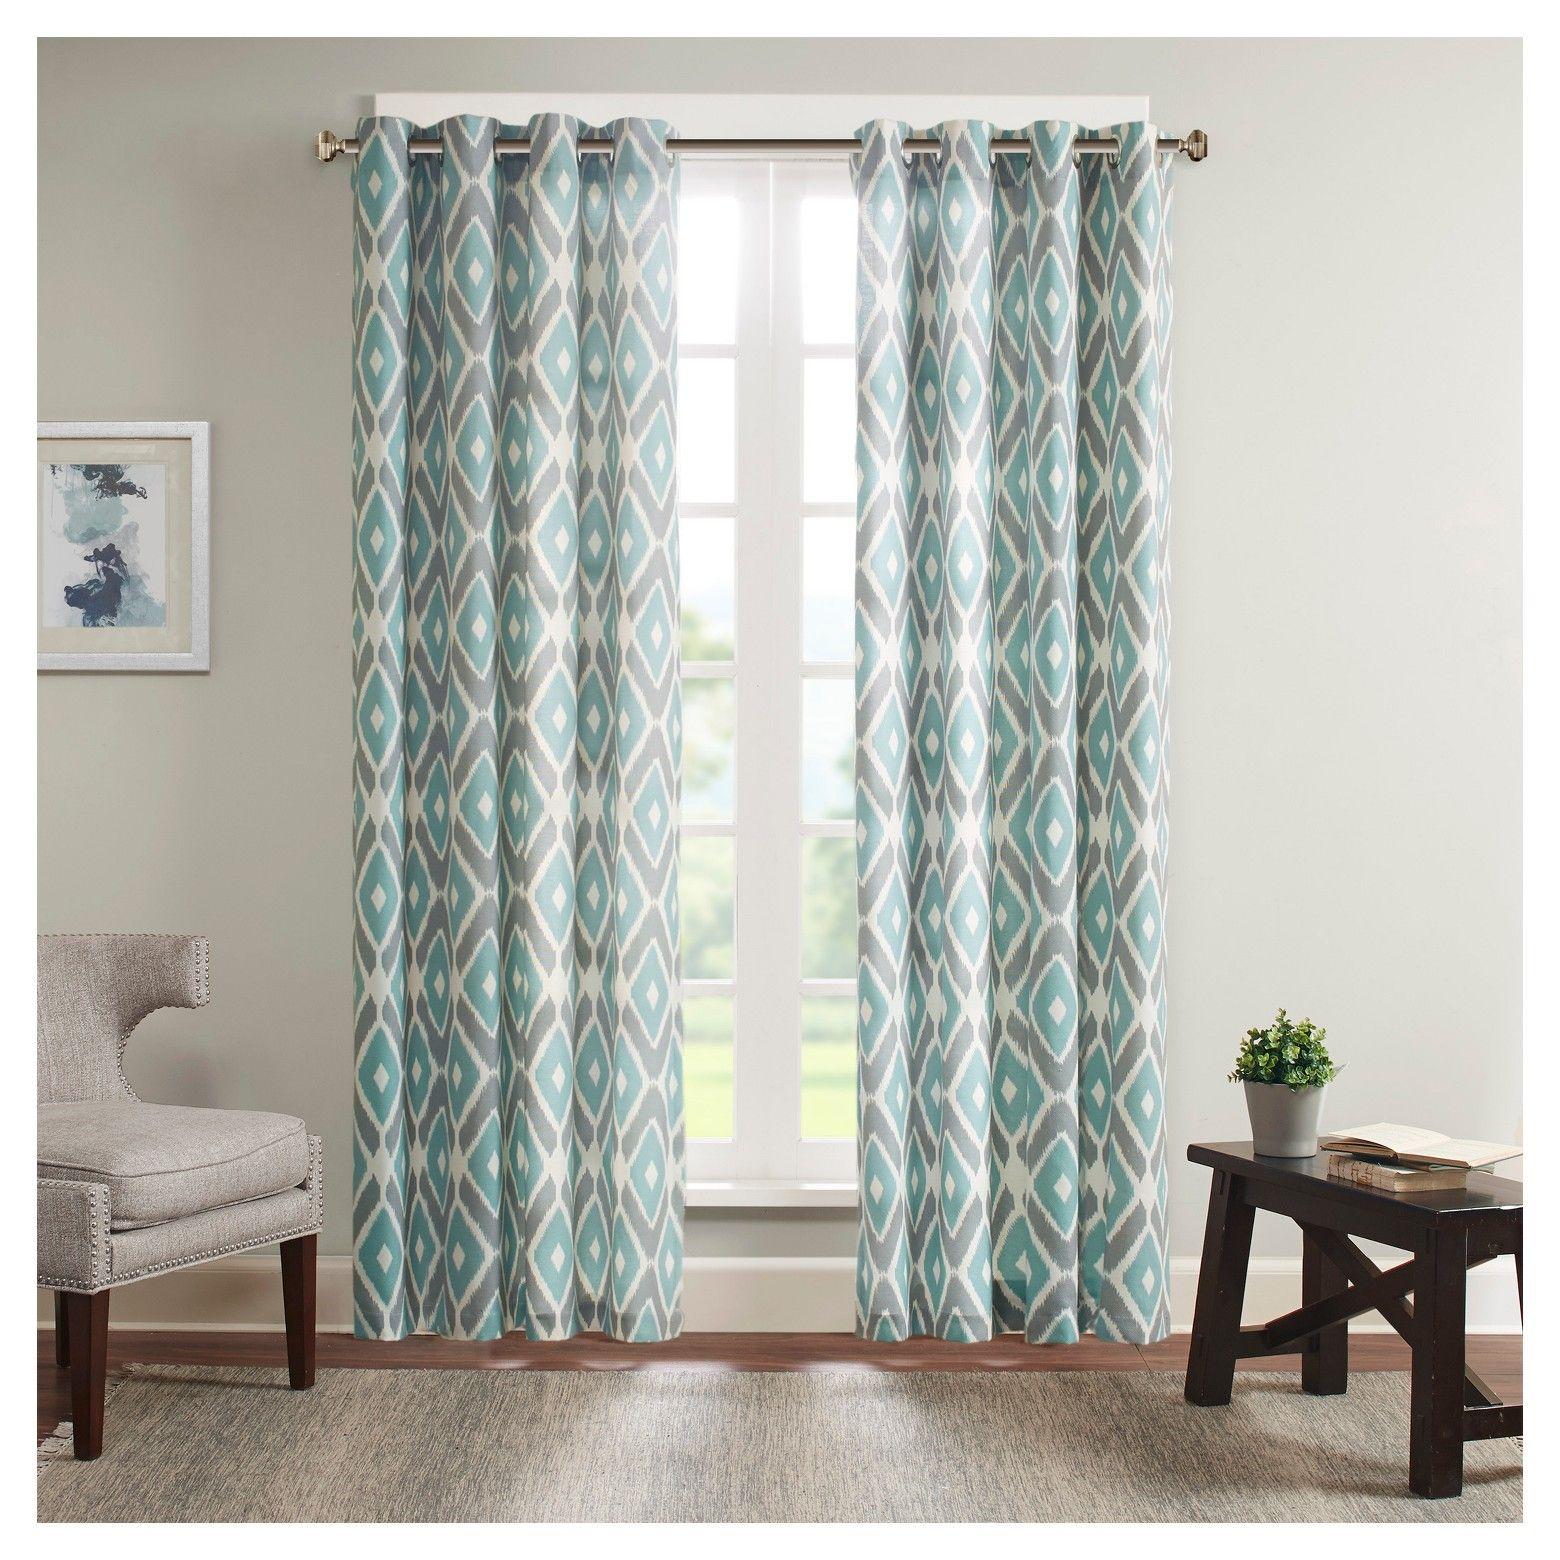 soft, durable poly/cotton/rayon construction • easyhang